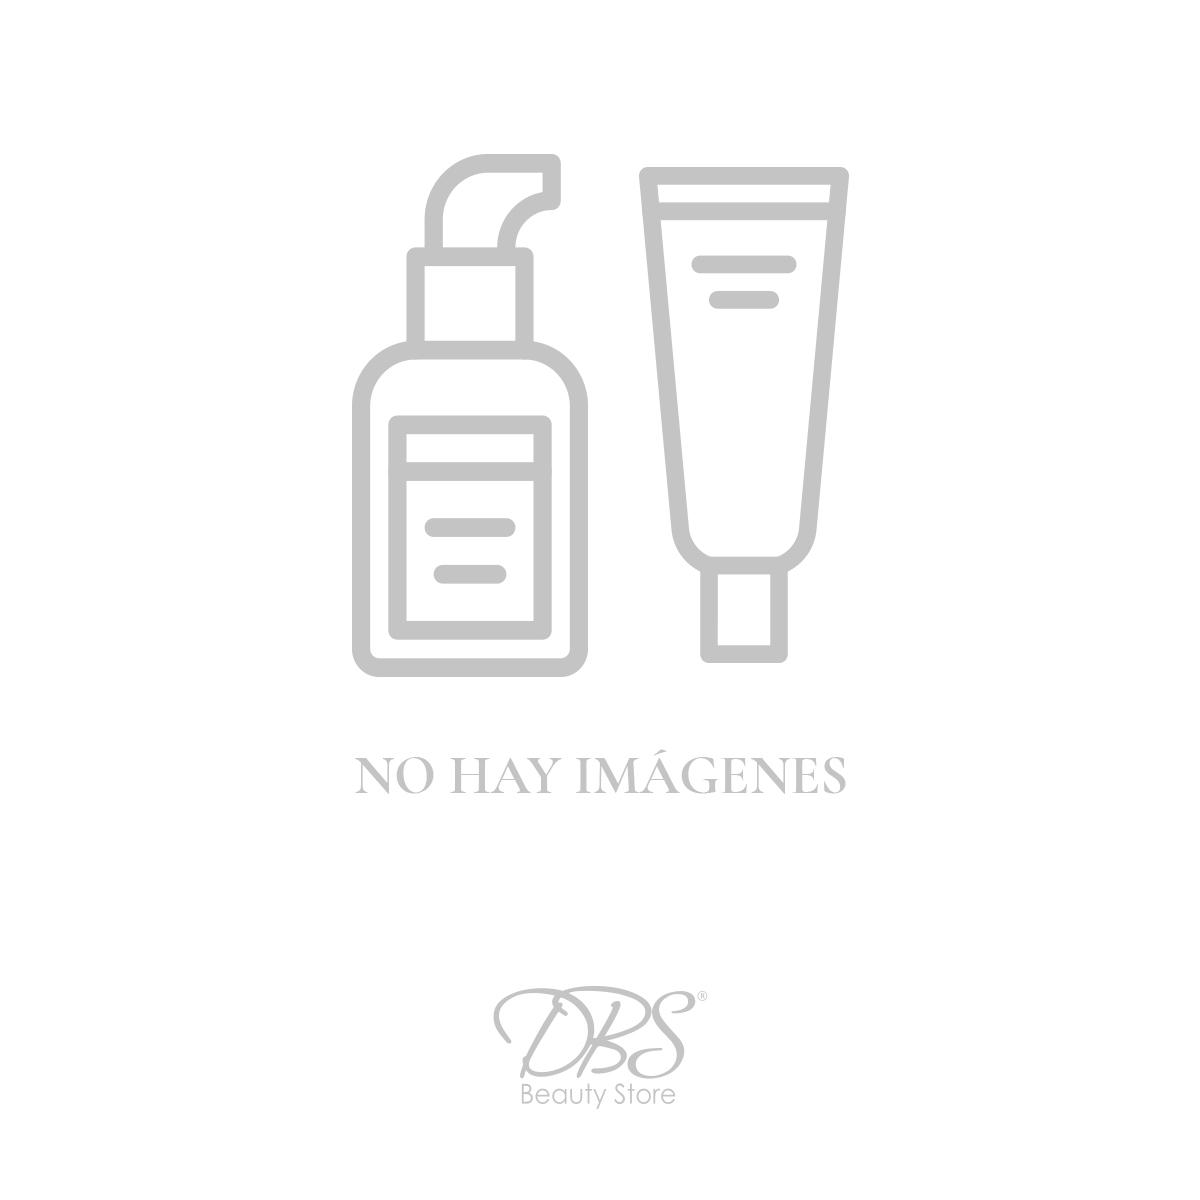 Desodorante Spray Unisex 24H Té Blanco 200 Ml